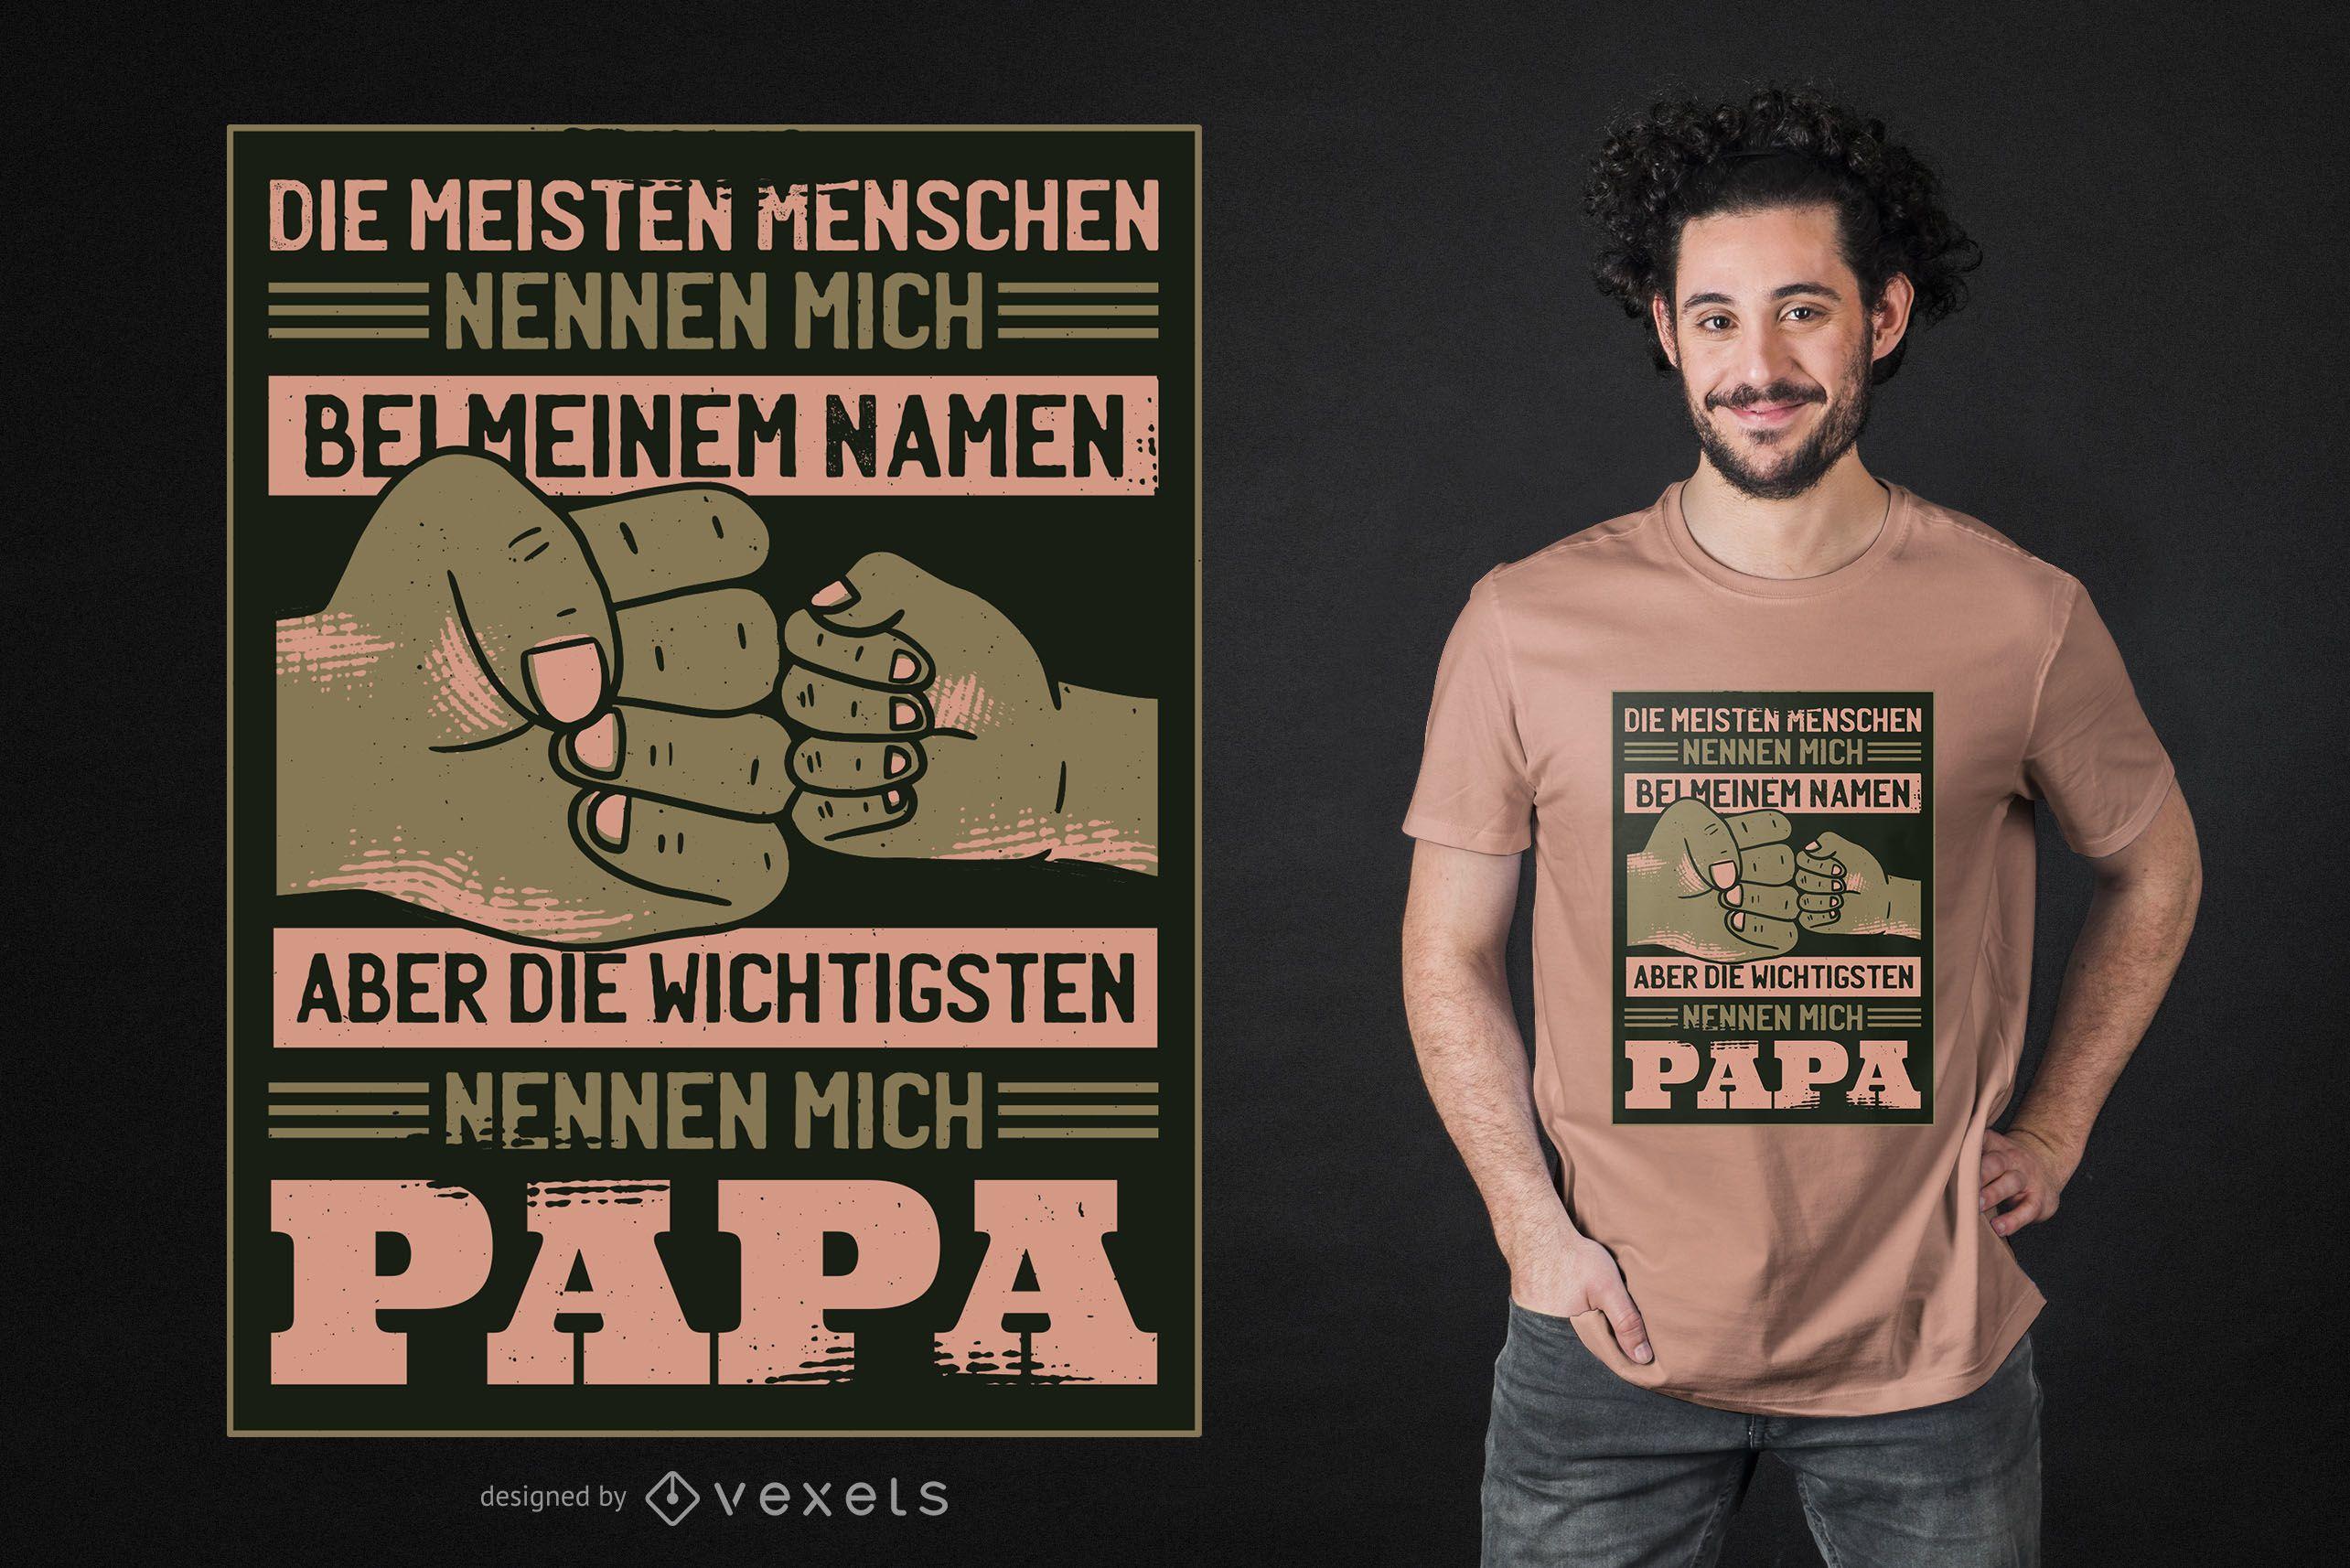 Dad german quote t-shirt design